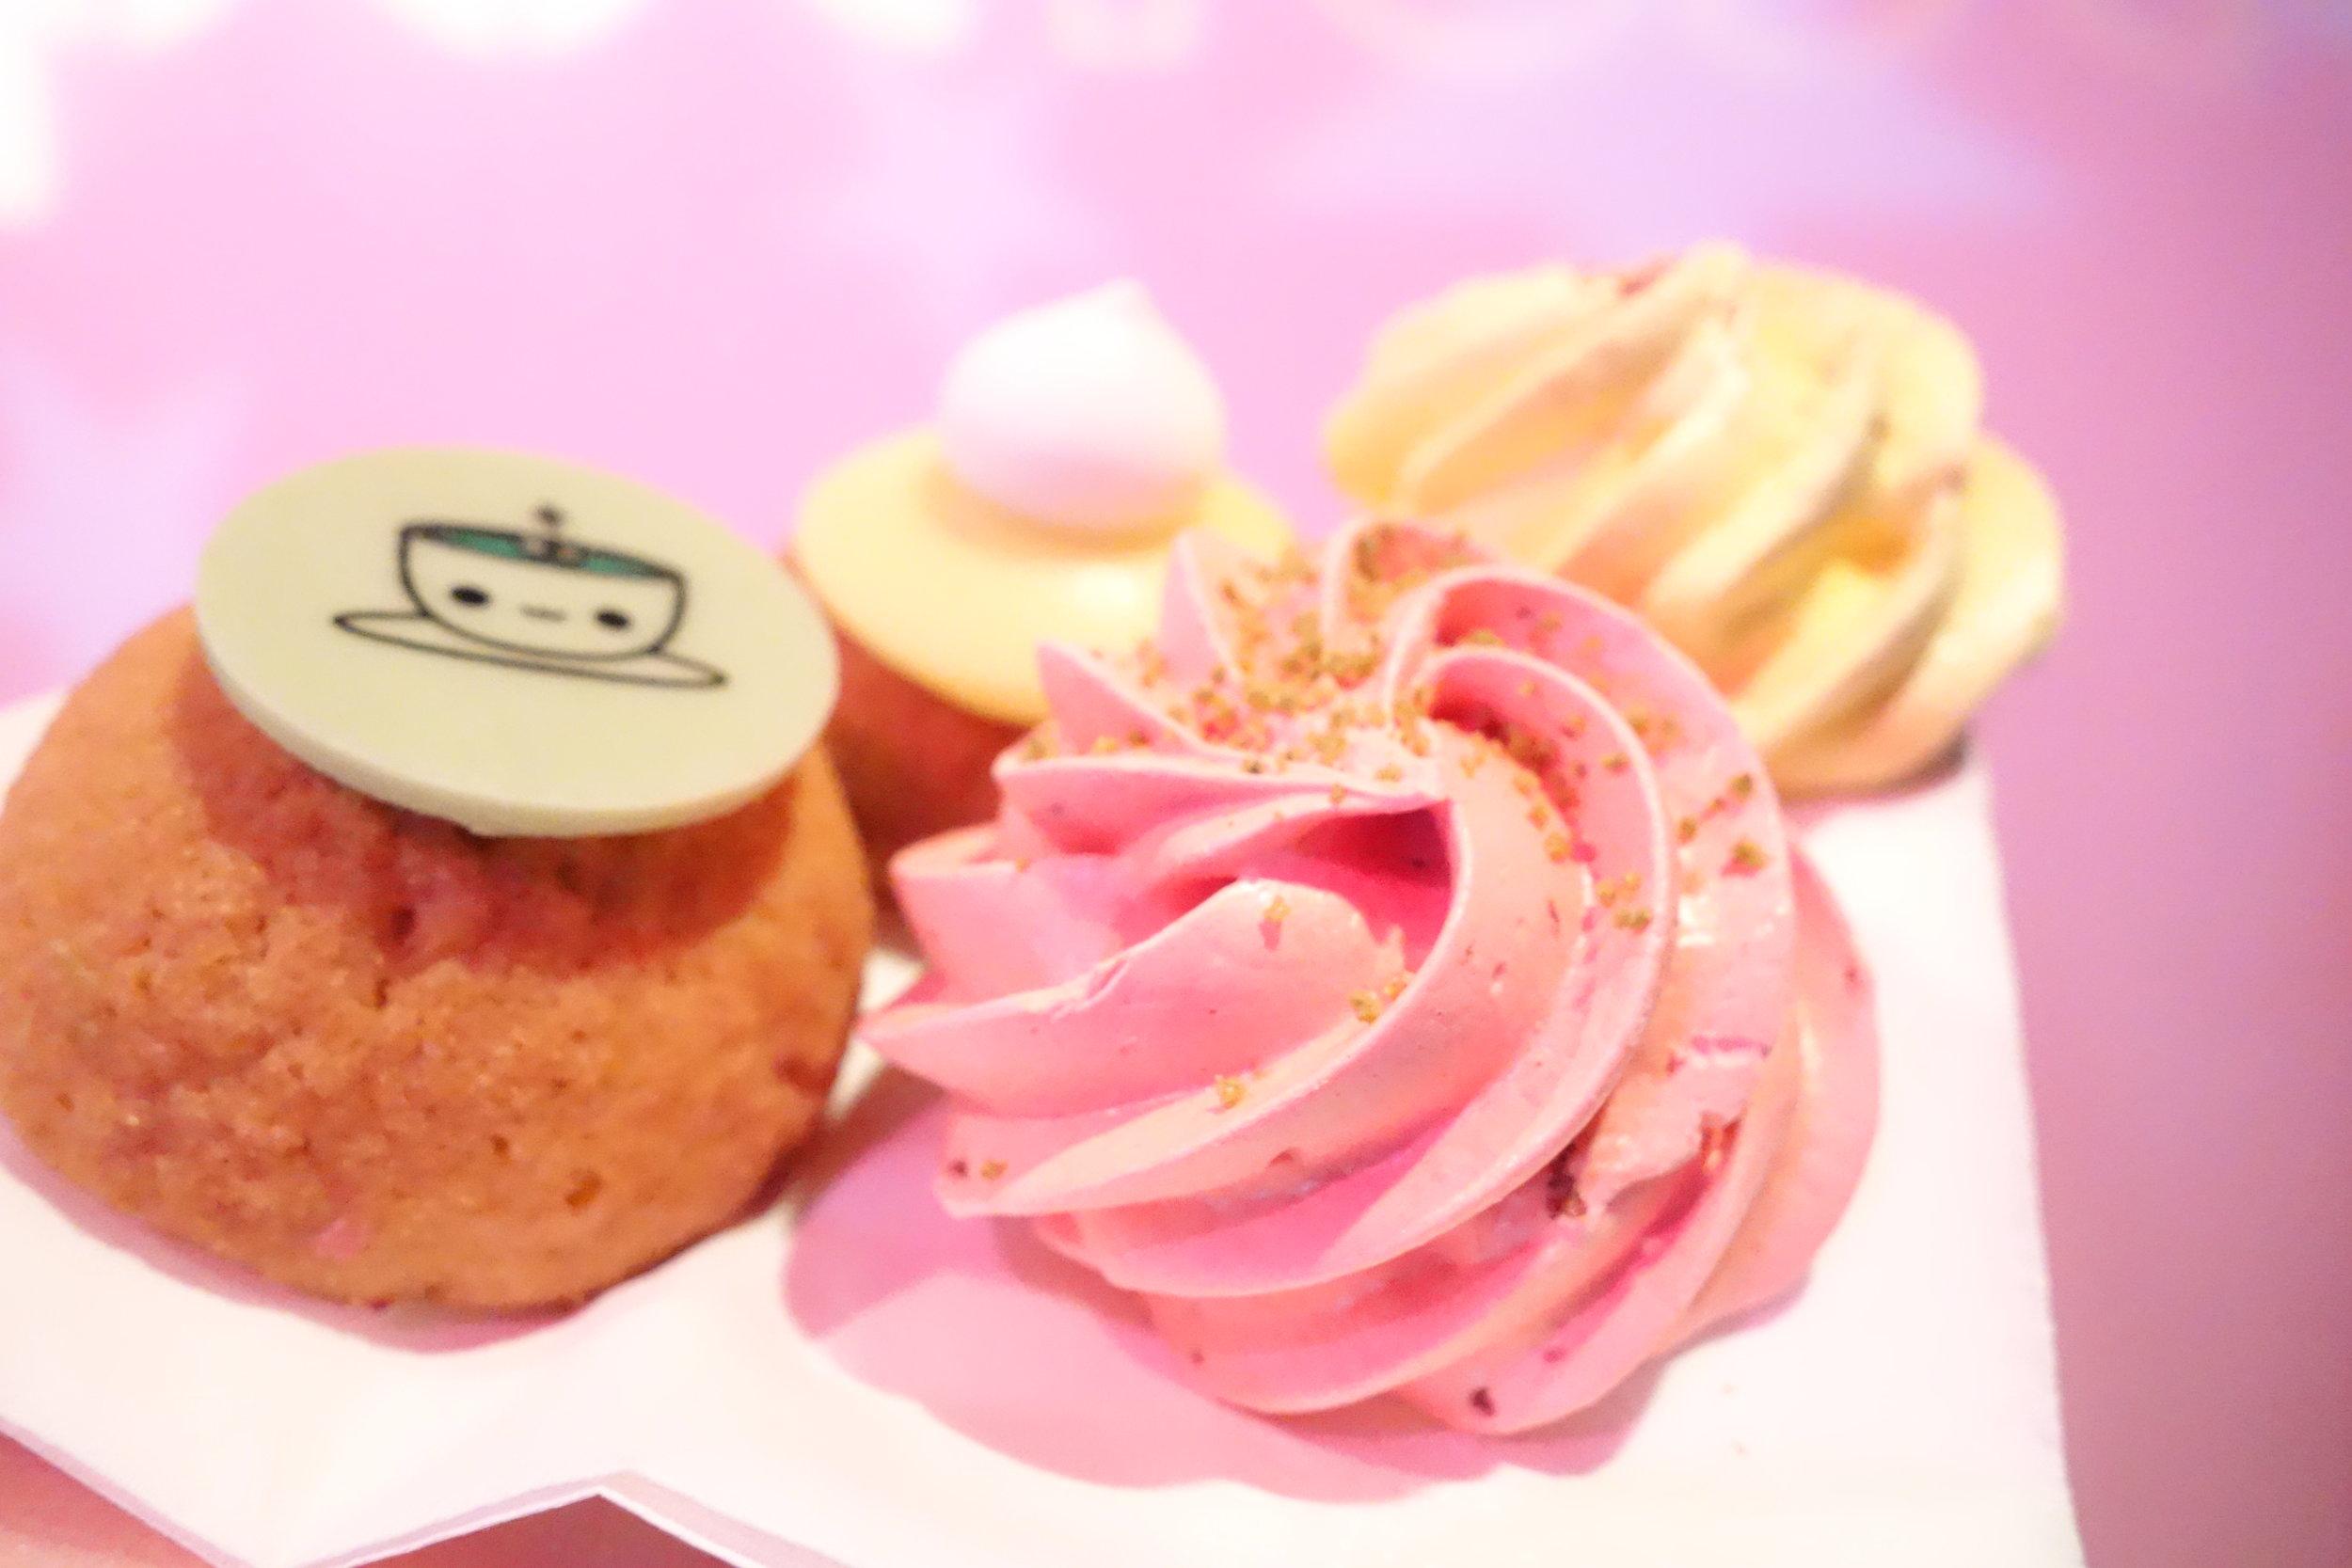 sweet-spot-fest-san-francisco-dessert-festival-2019-sf-food-photography-sandy-by-the-bay-sf-food-blog-choux-desserts-choux-pastries-choux-pastry-choux-dessert-san-francisco